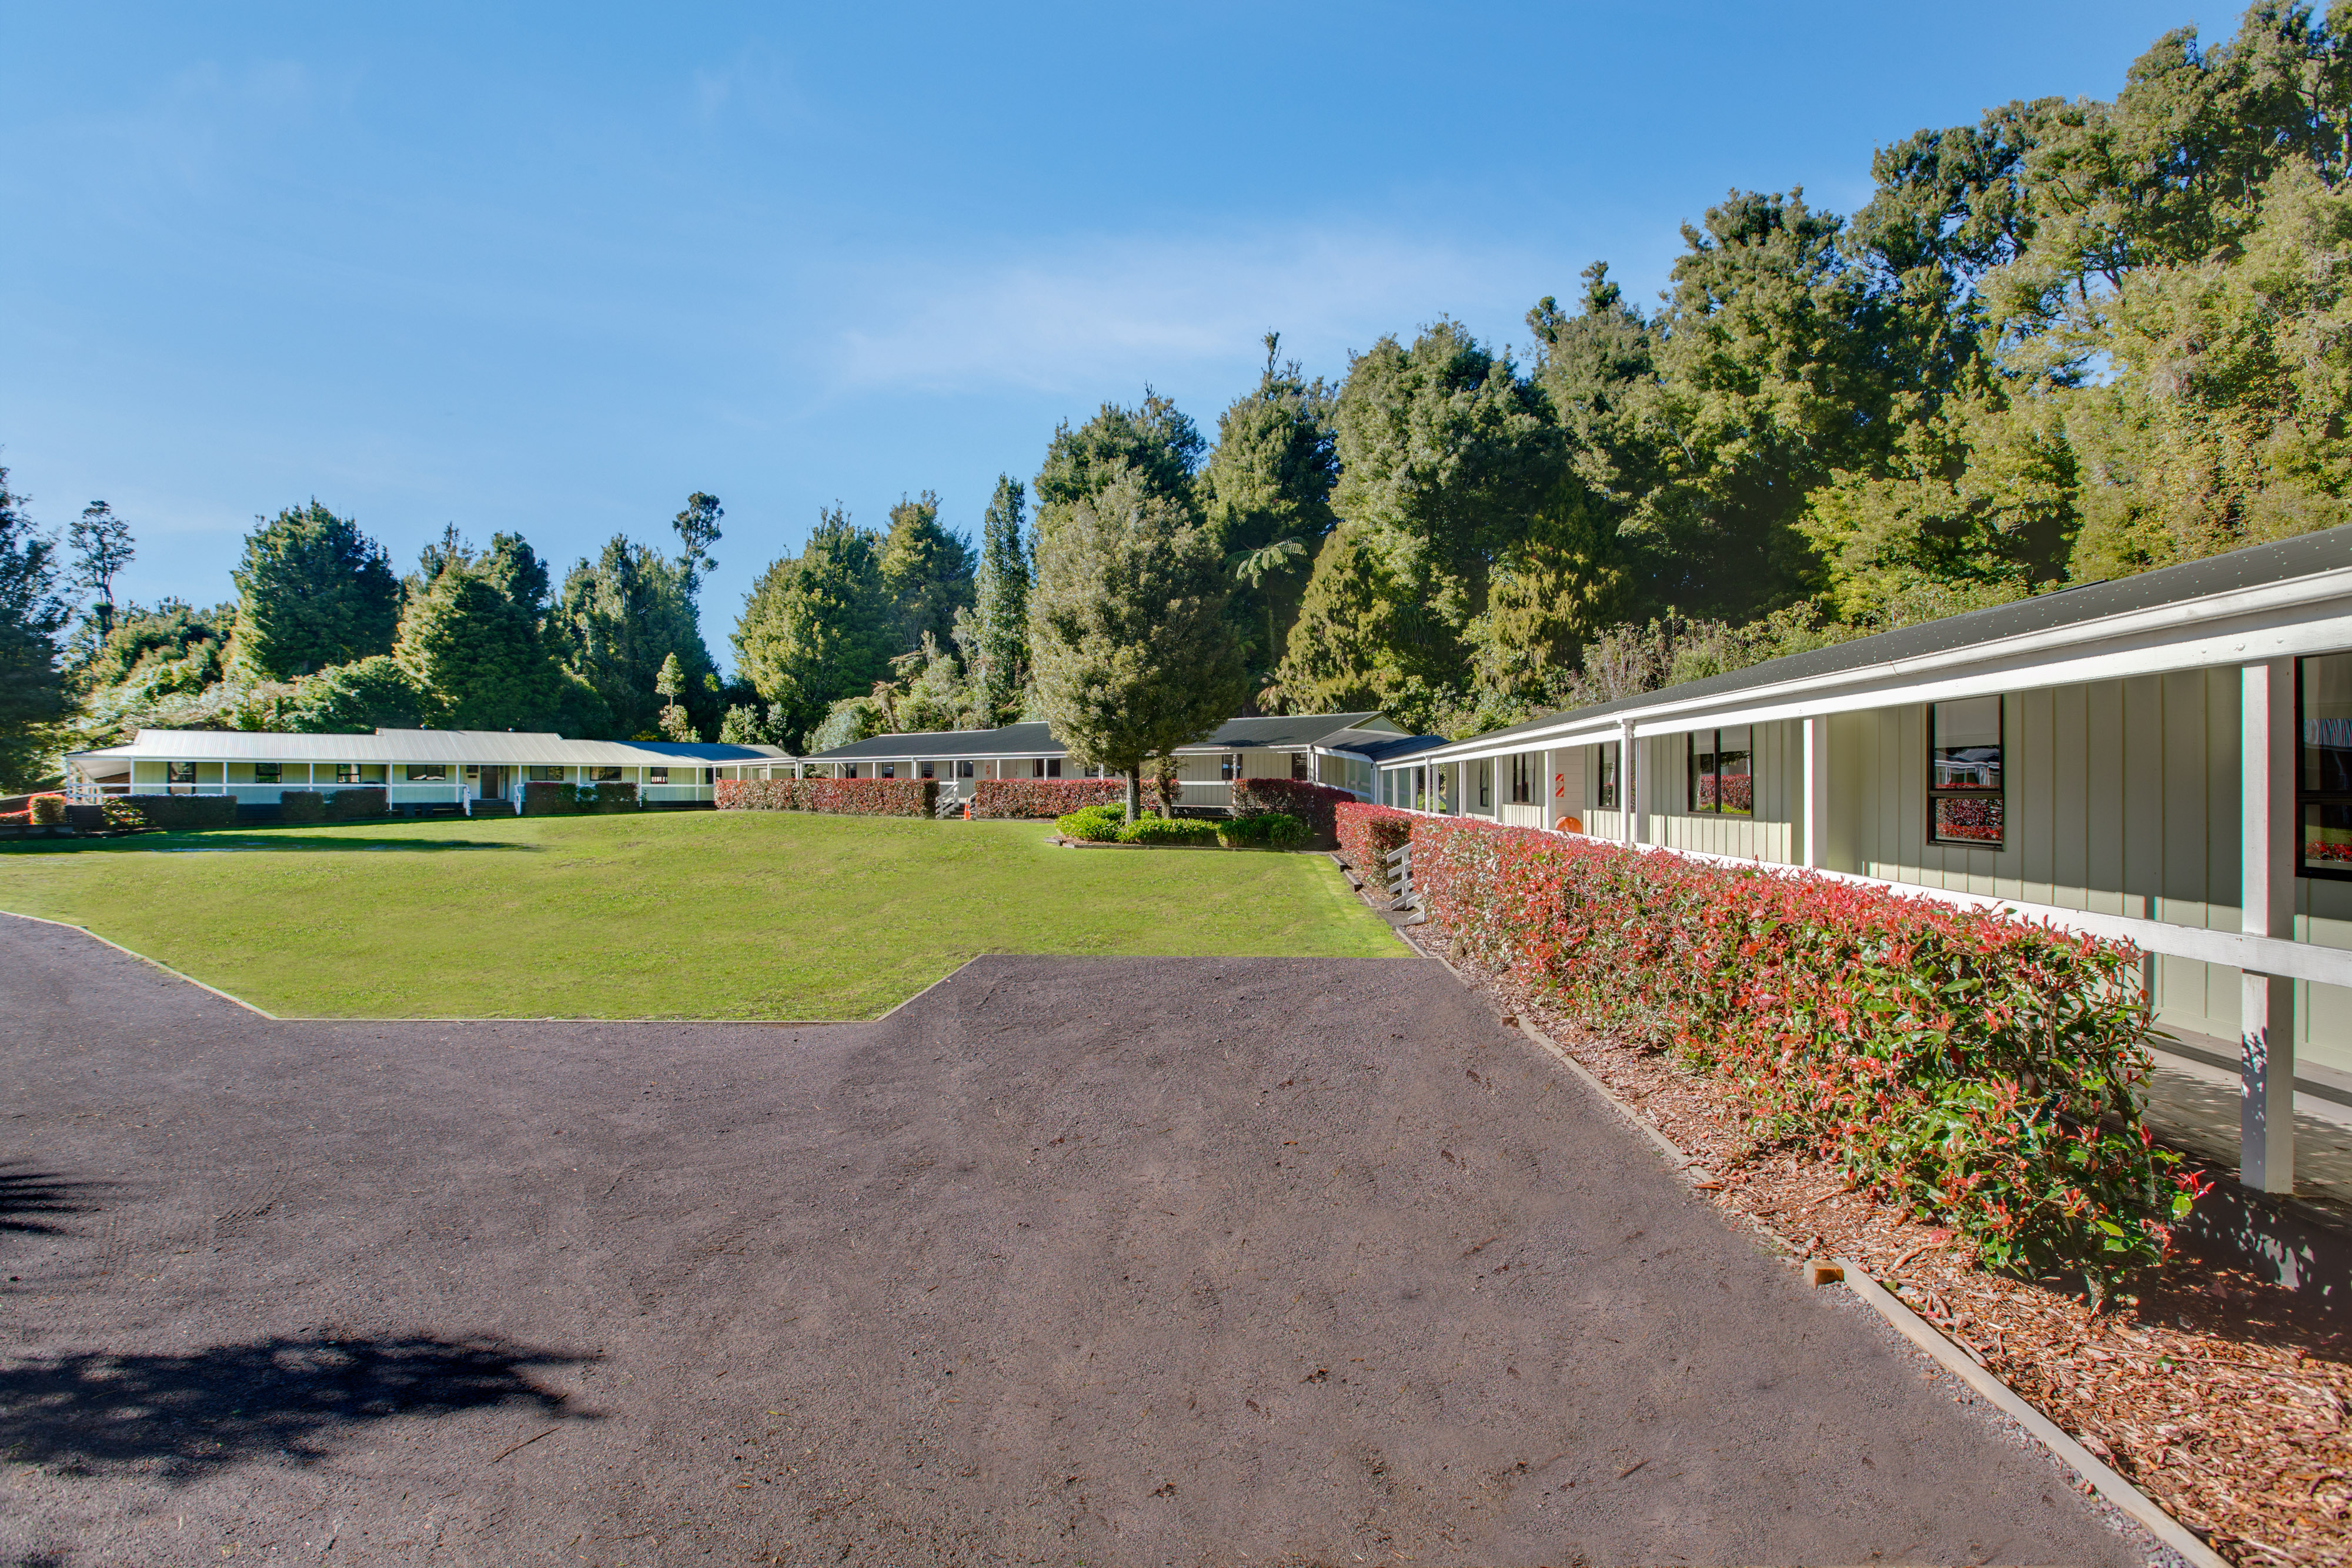 Tui Ridge Park Dorm Grounds